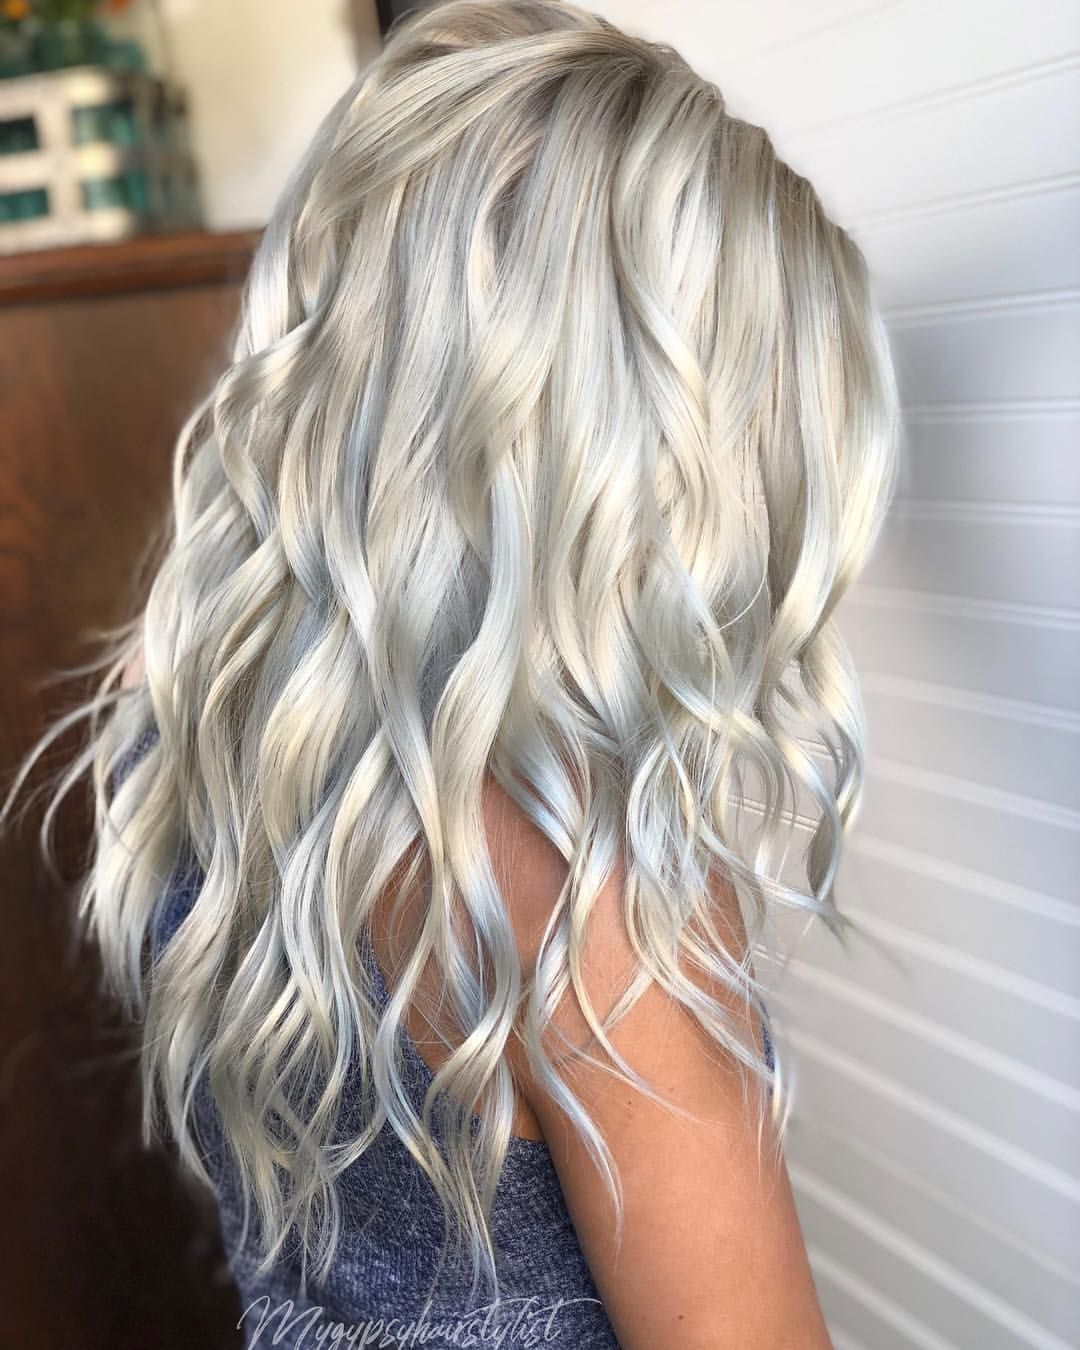 Platinum Hair White Hair Rooty Blonde Blonde Highlights Icy Blonde Ashy Hair Color Blonde Hair Ideas Hair Icy Blonde Hair Icy Blonde Blonde Highlights